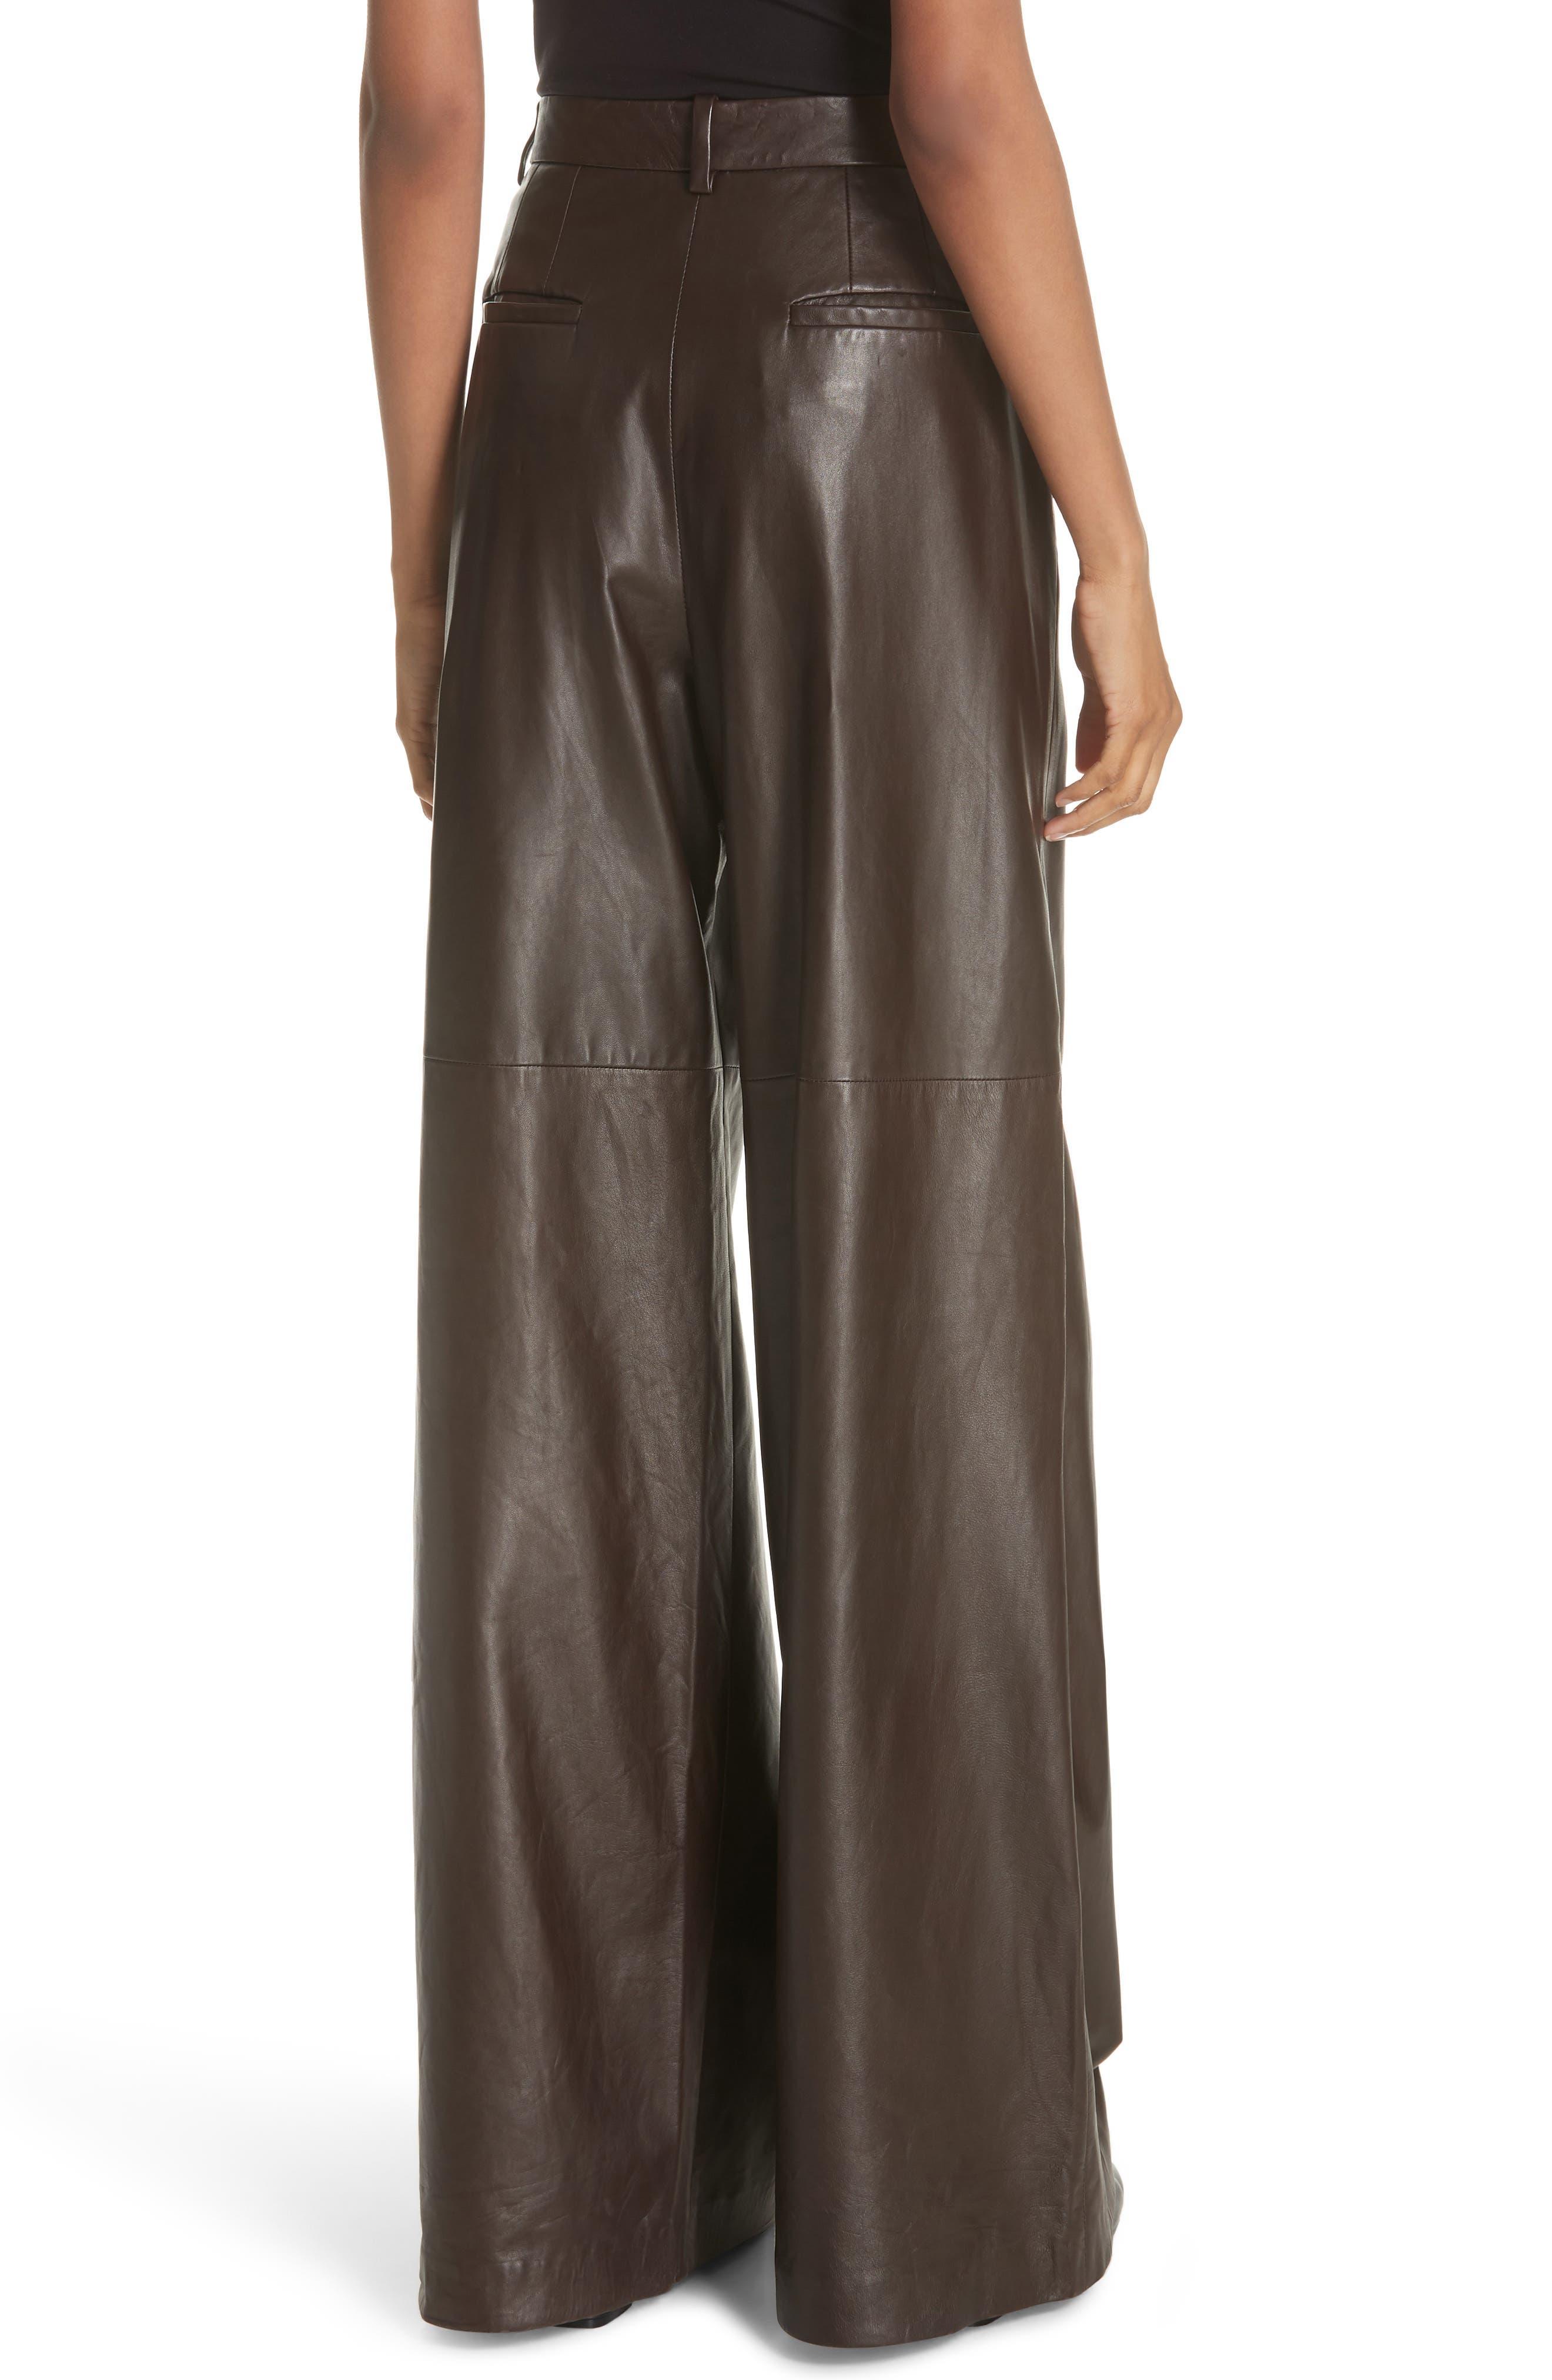 NILI LOTAN, Nico Leather Pants, Alternate thumbnail 2, color, BROWN